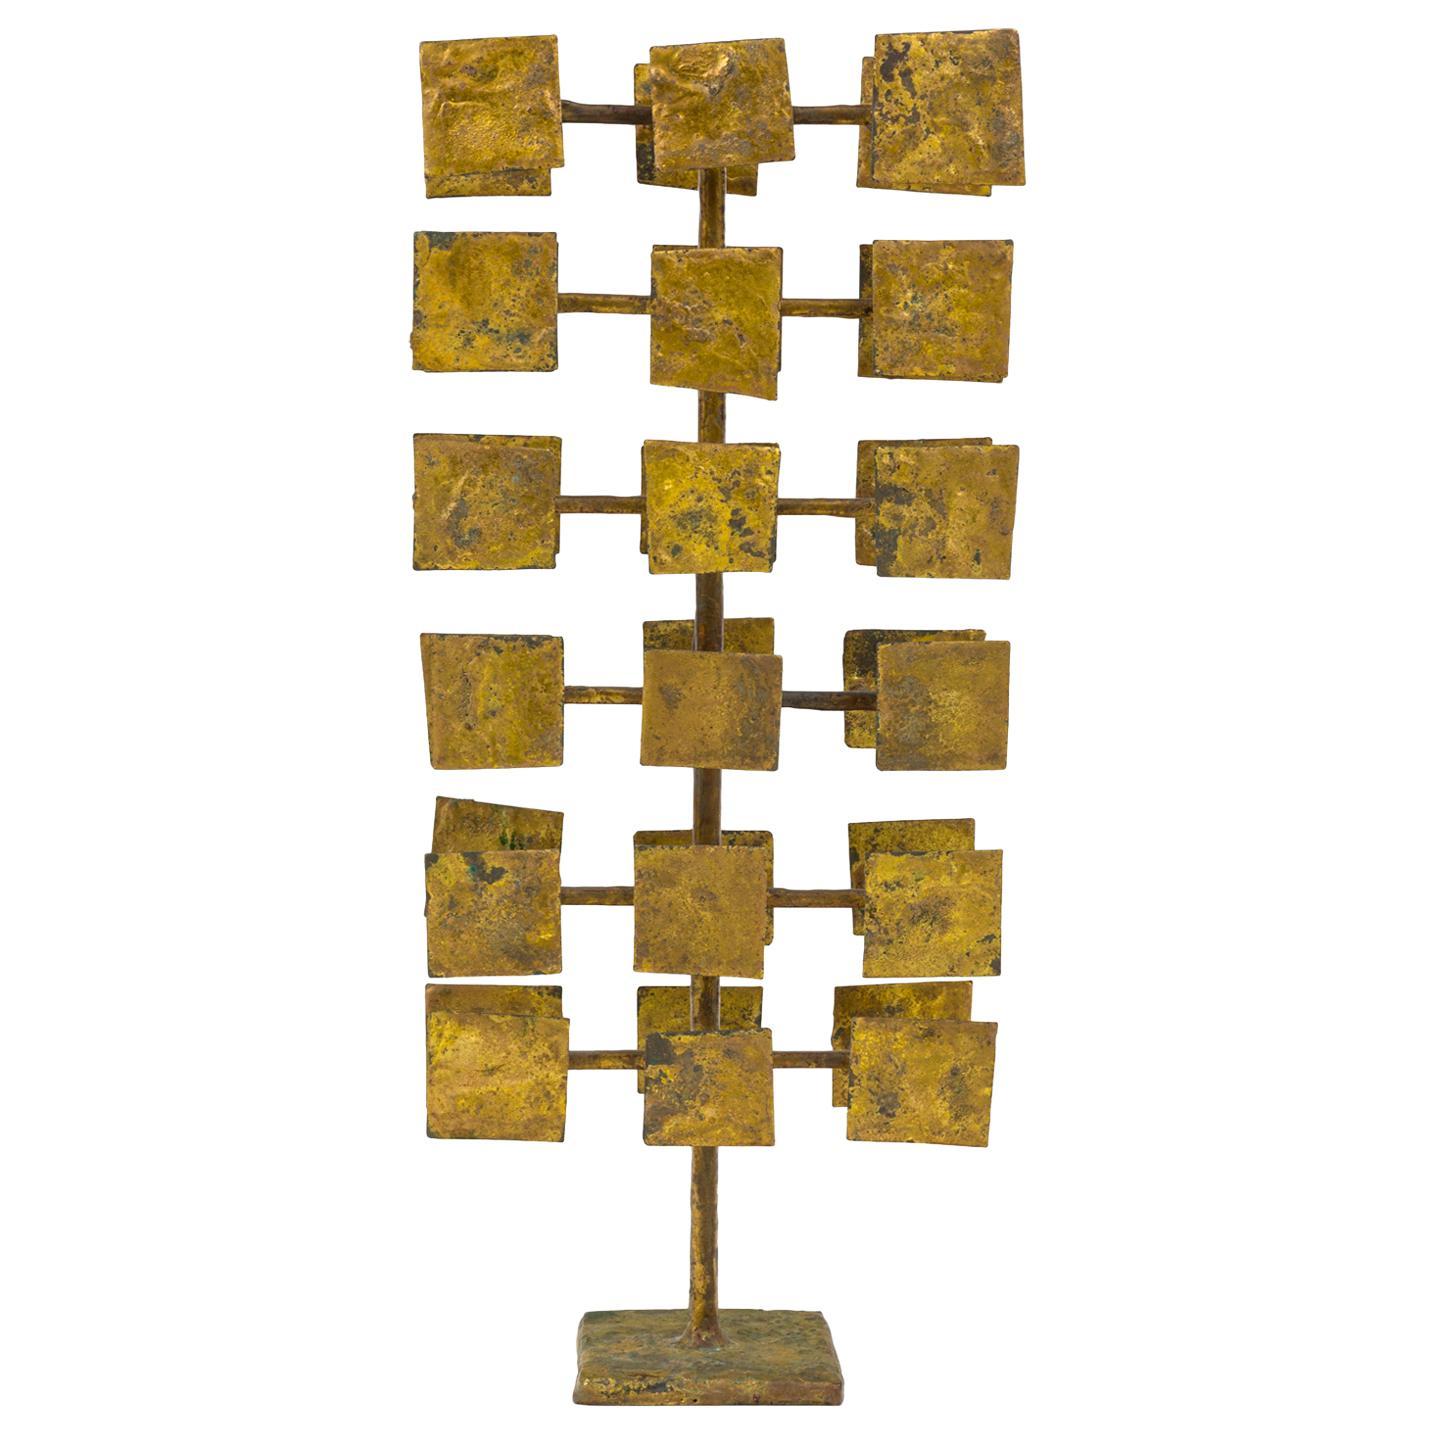 Harry Bertoia Maquette for Melt Coat Sculpture Screen for Bank of Miami, 1958